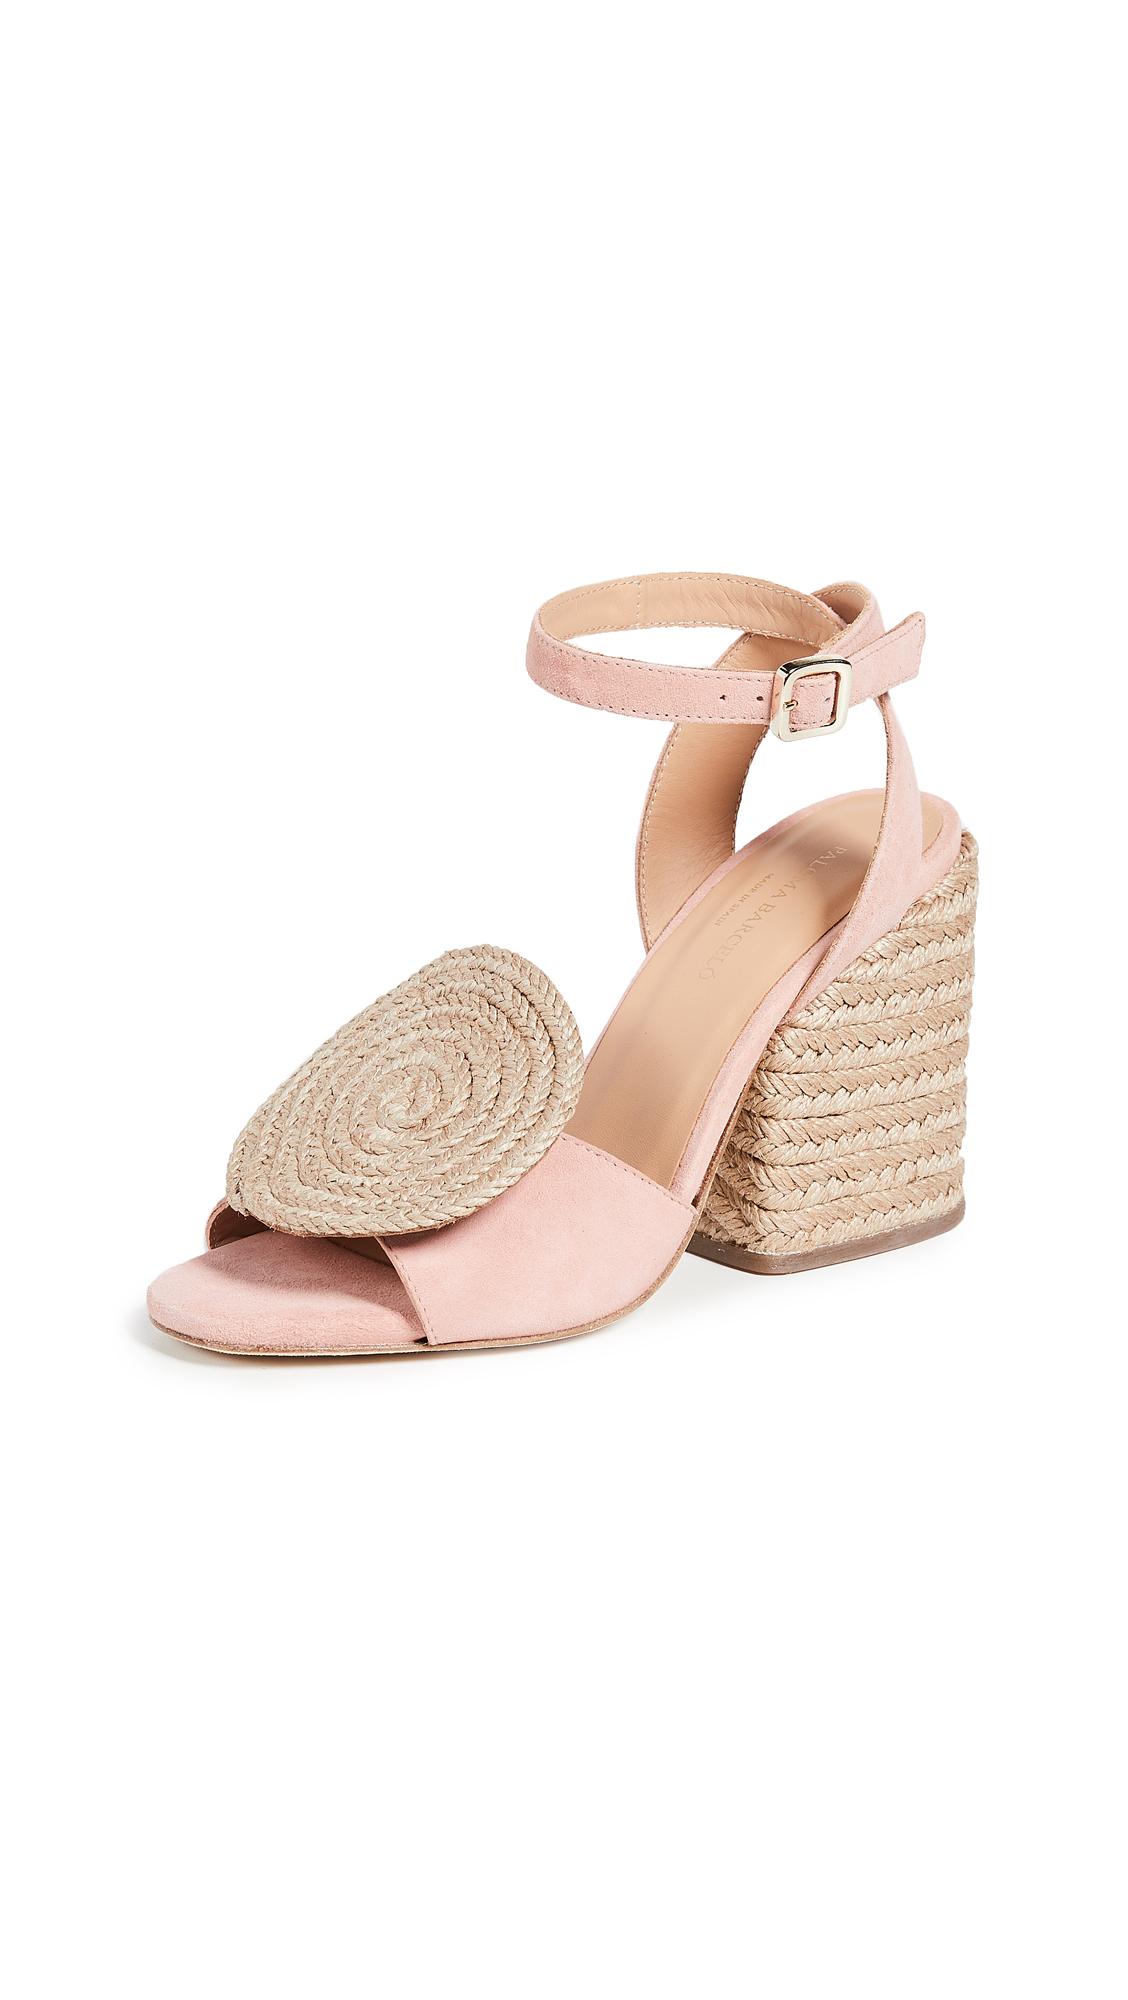 Paloma Barcelo Emi Circle Espadrille Sandals